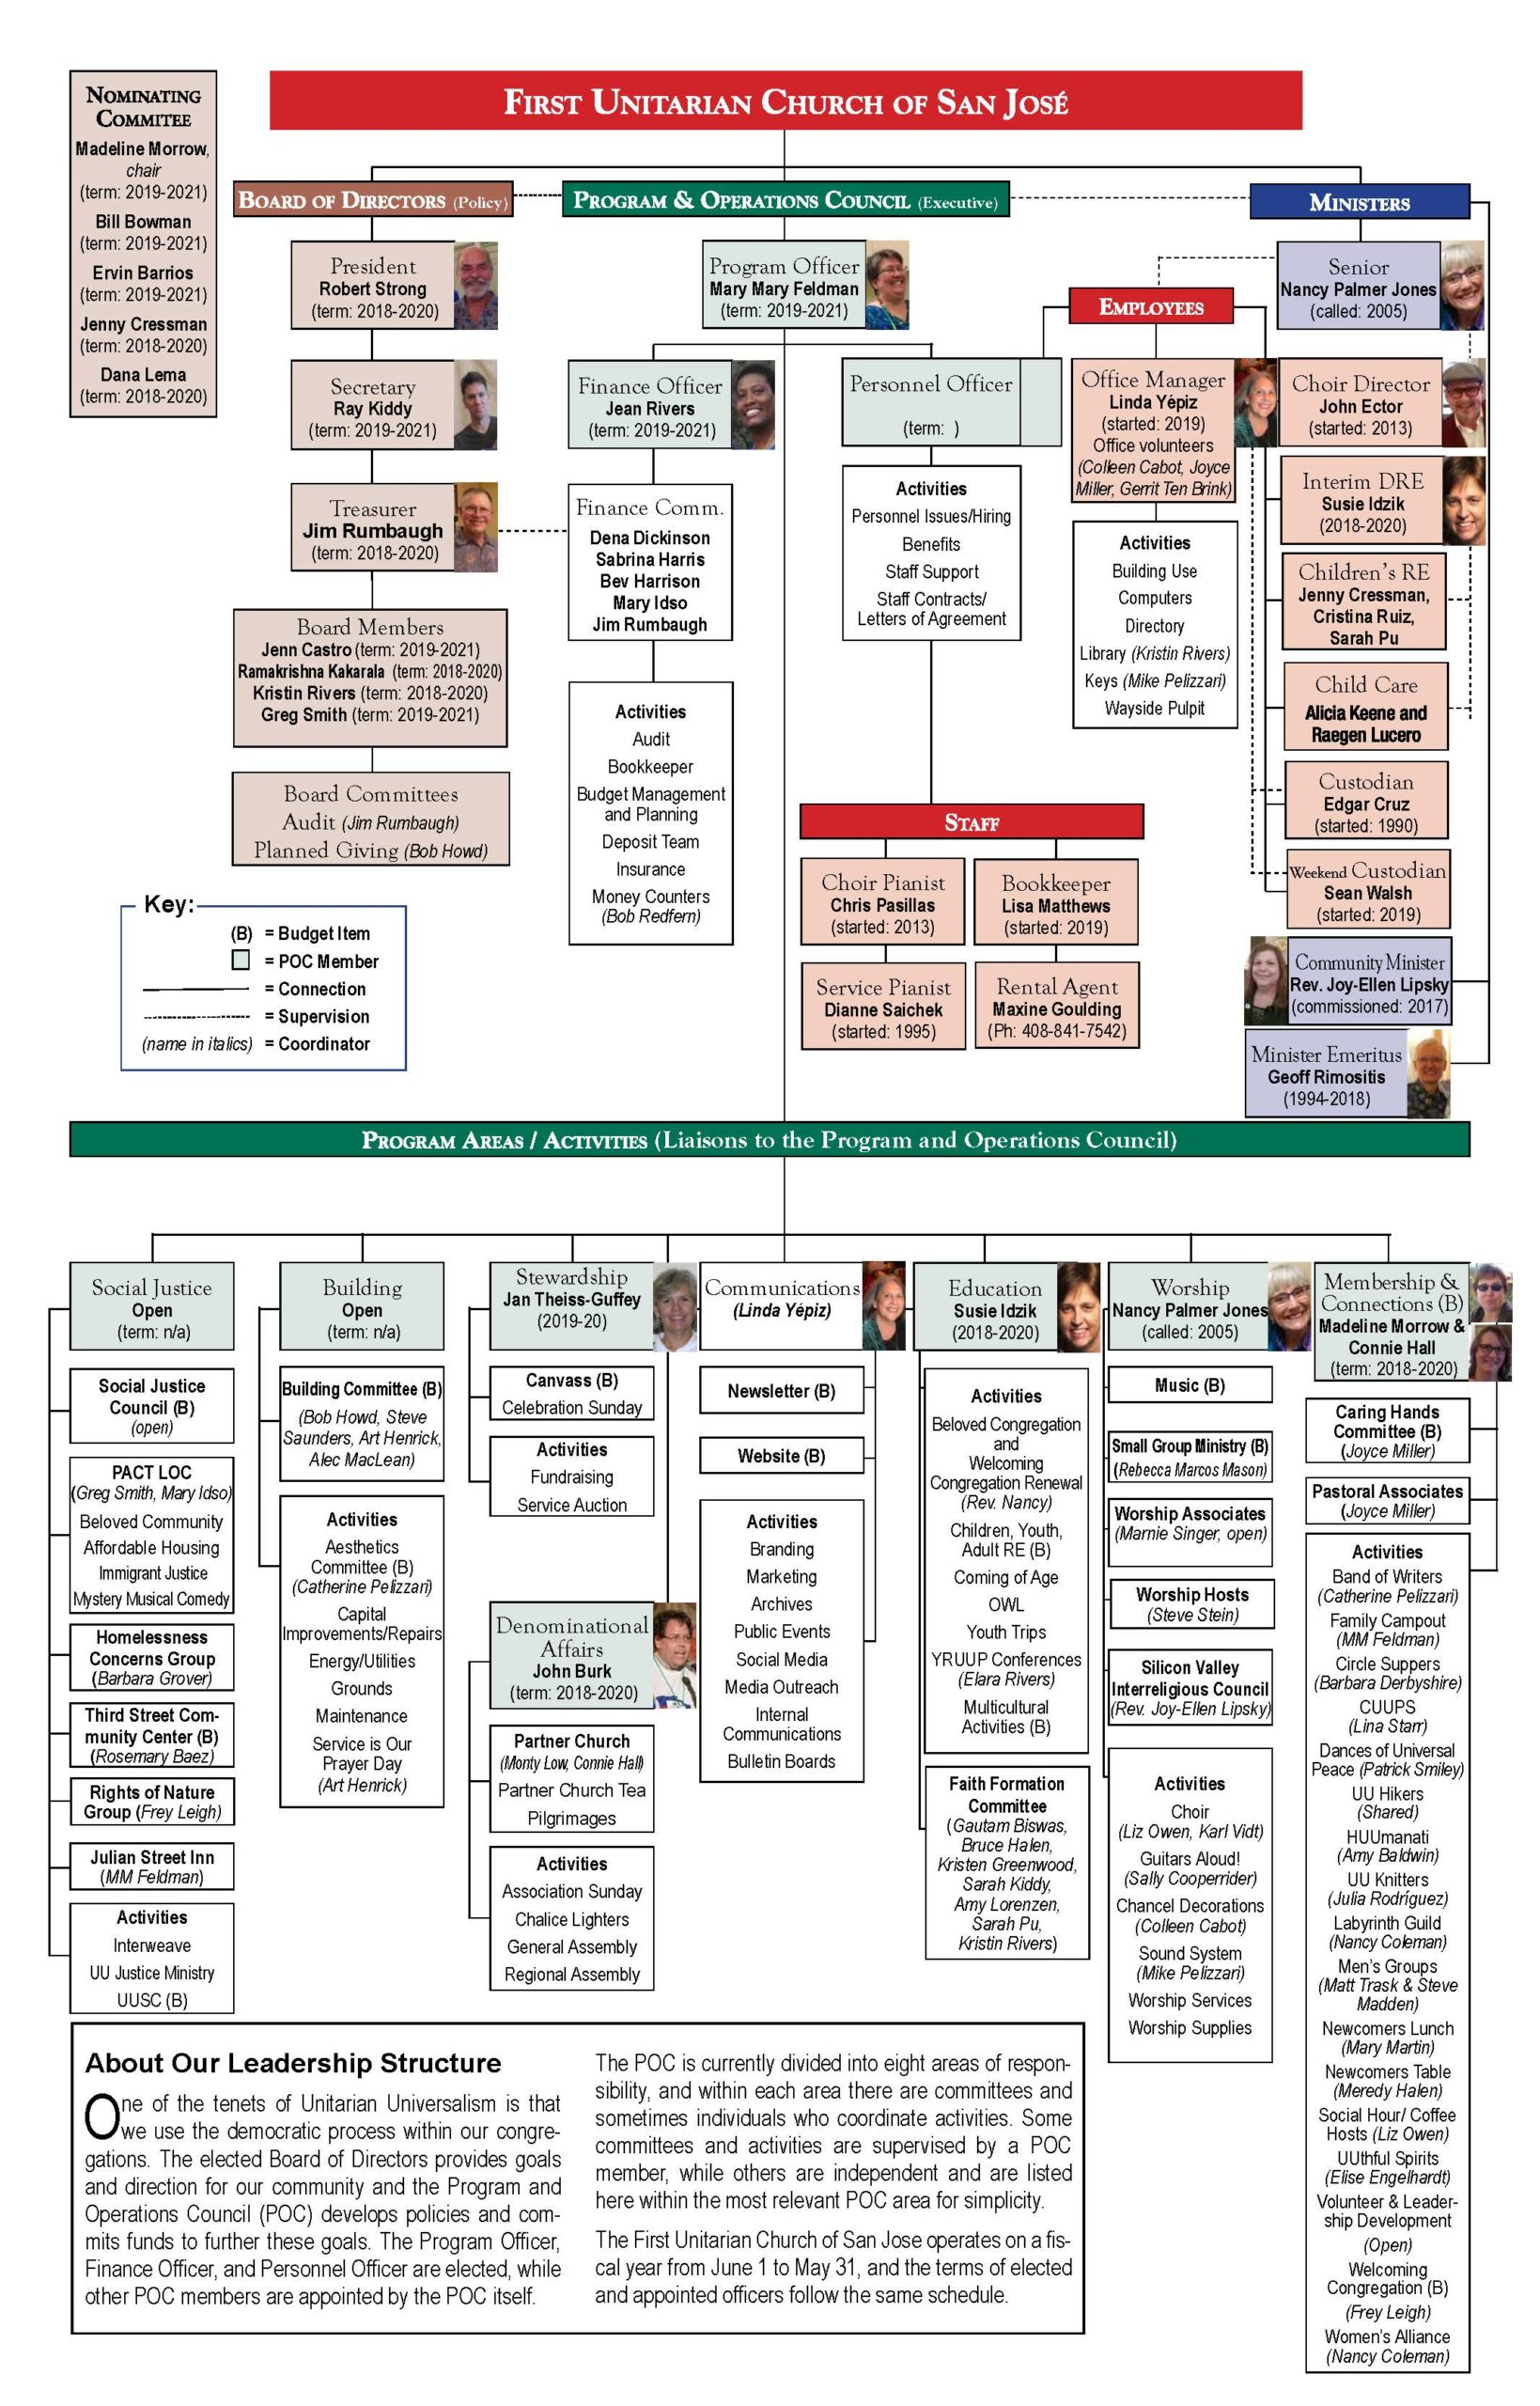 FUCSJ Org Chart 2019